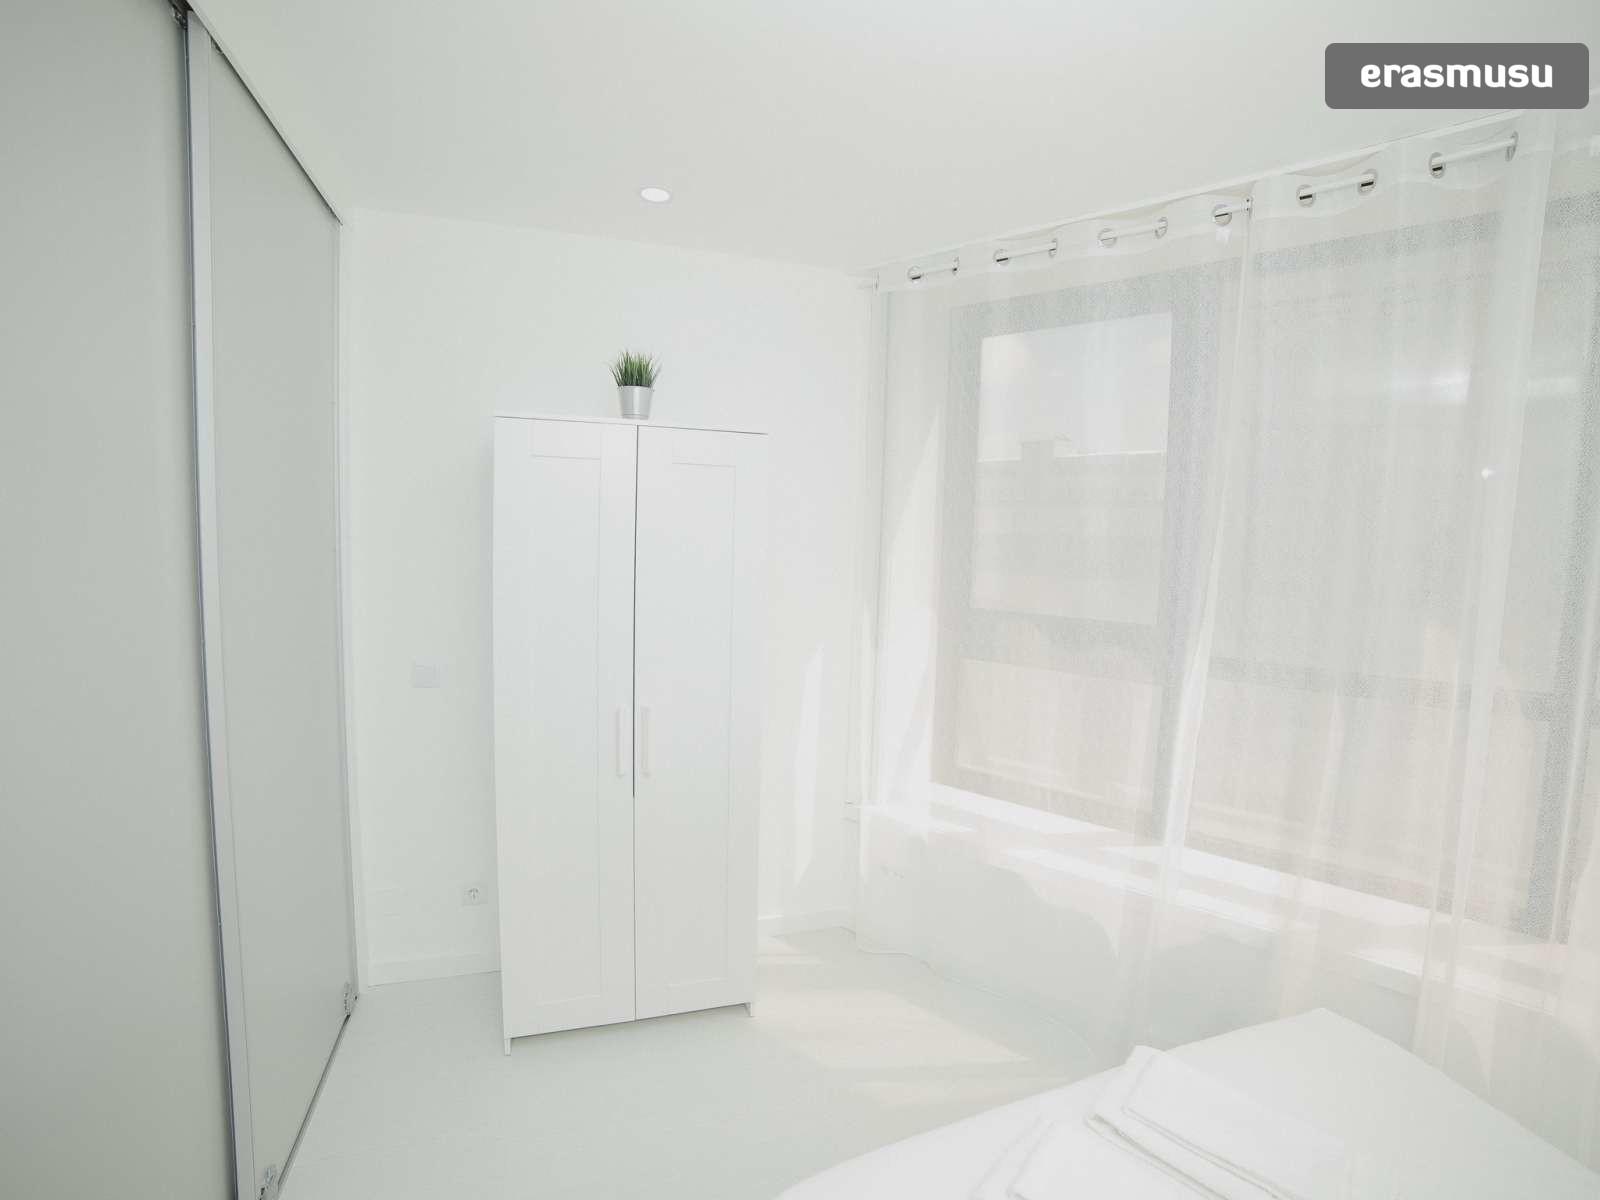 bright-studio-rent-santo-ildefonso-porto-d549de26341b9e312d2d480